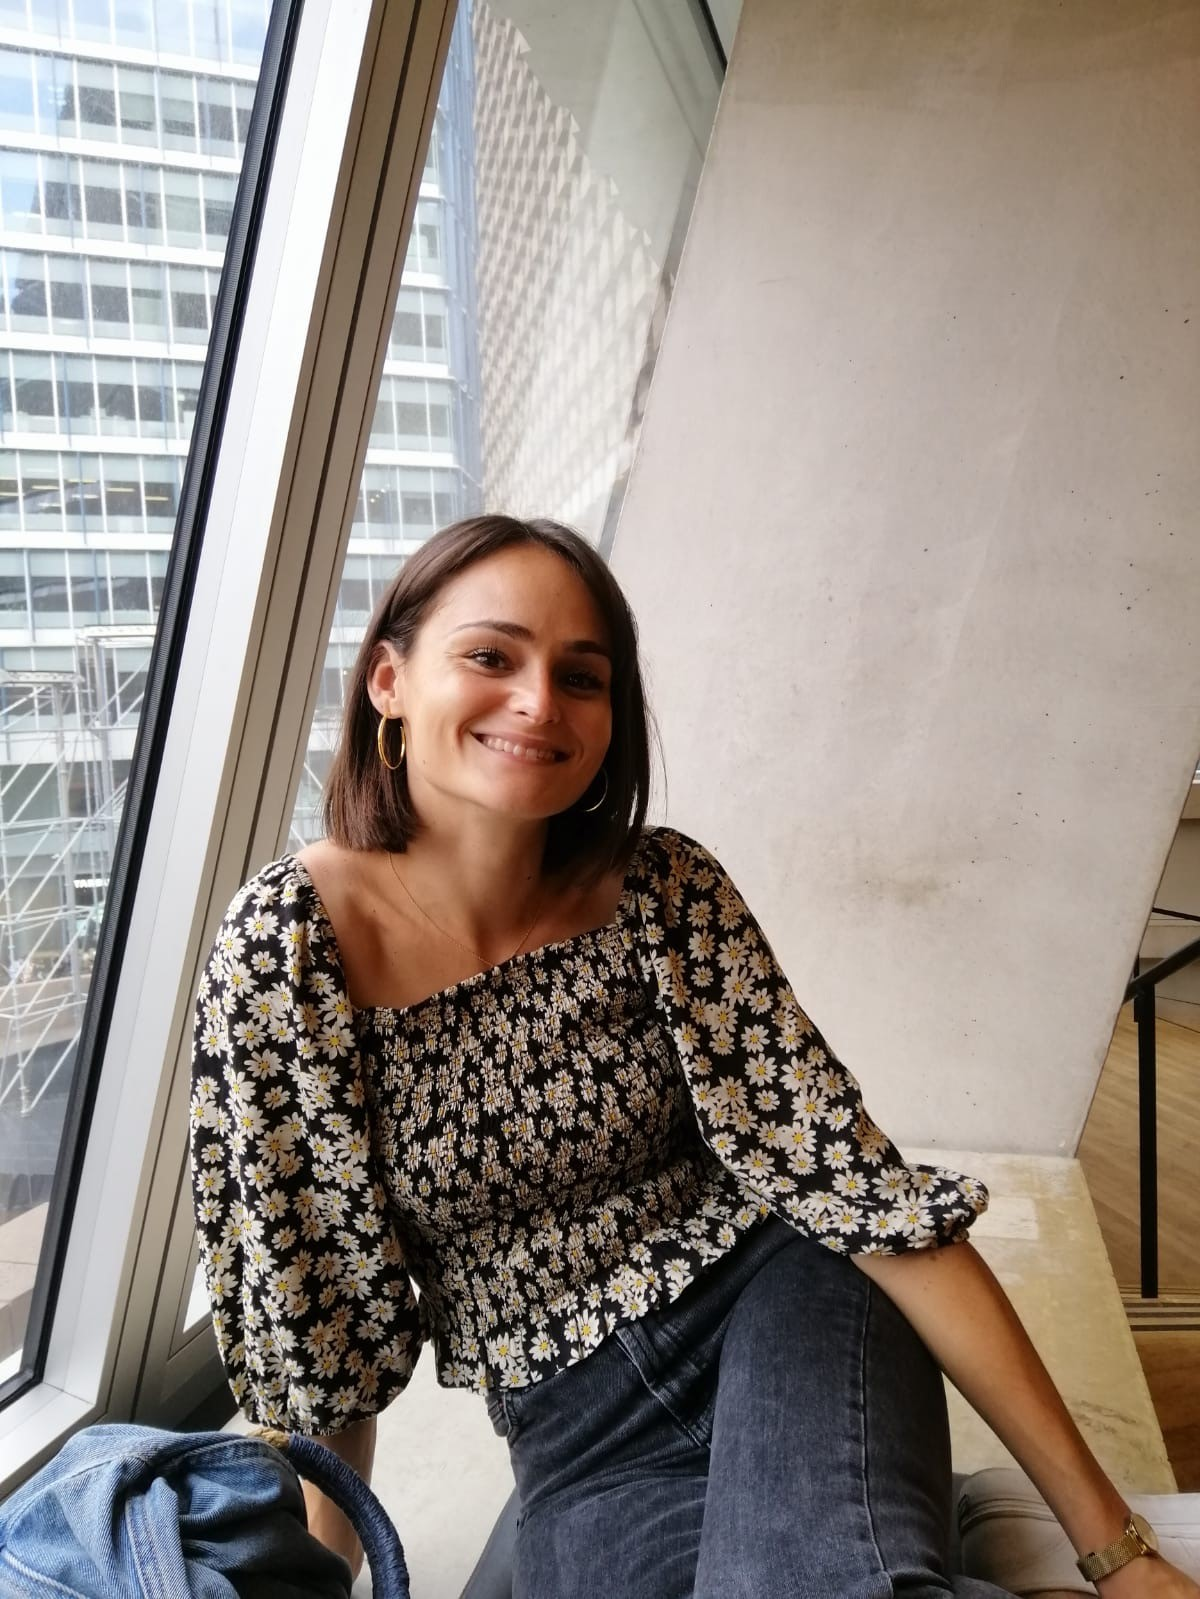 Kristina Oundjian